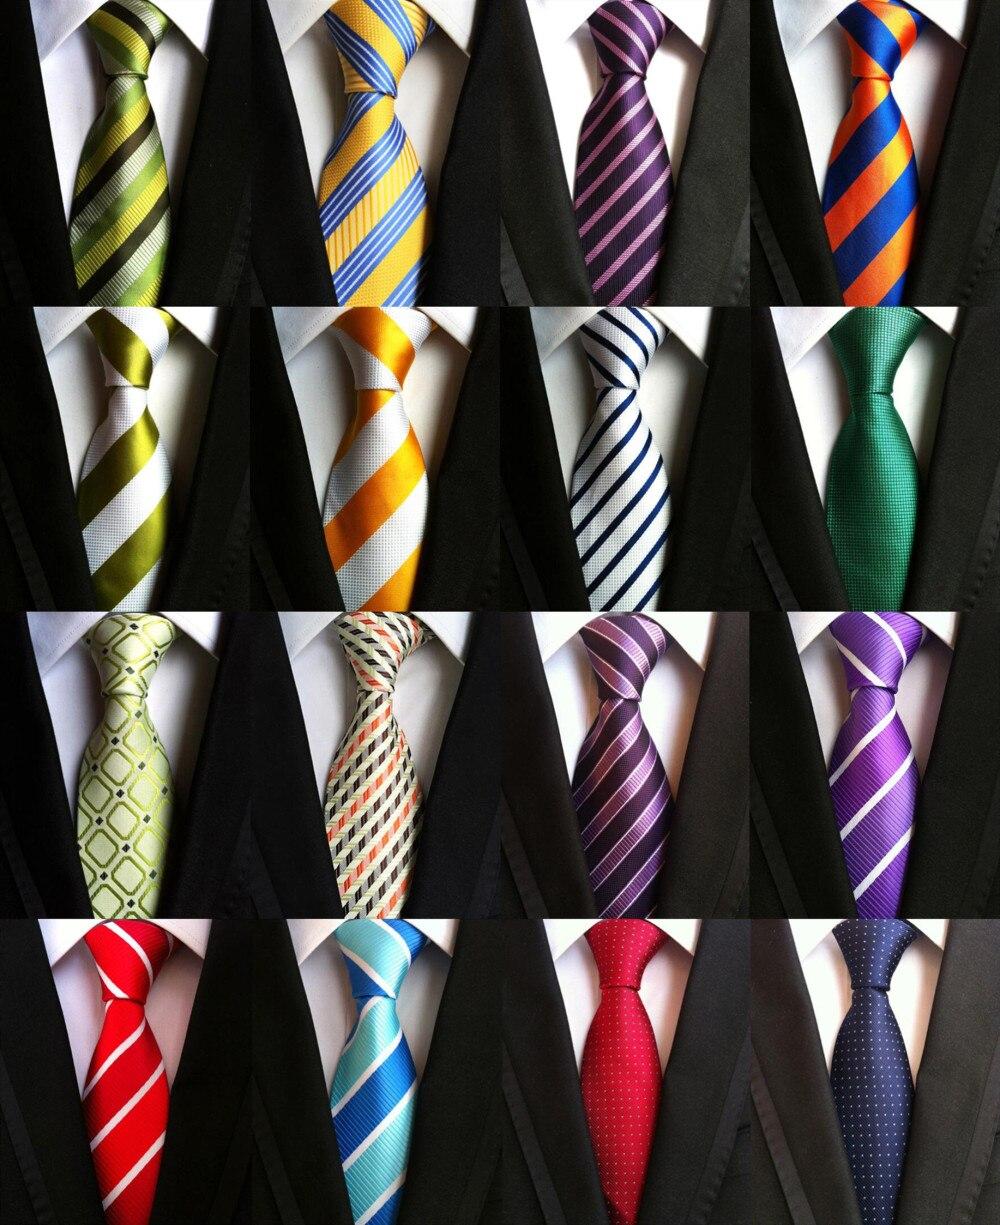 Yellow Purple Green Red Blue White Mens Business Tie Formal Striped 8cm Jacquard Wedding Necktie Narrow Classic Neckwear Gravata